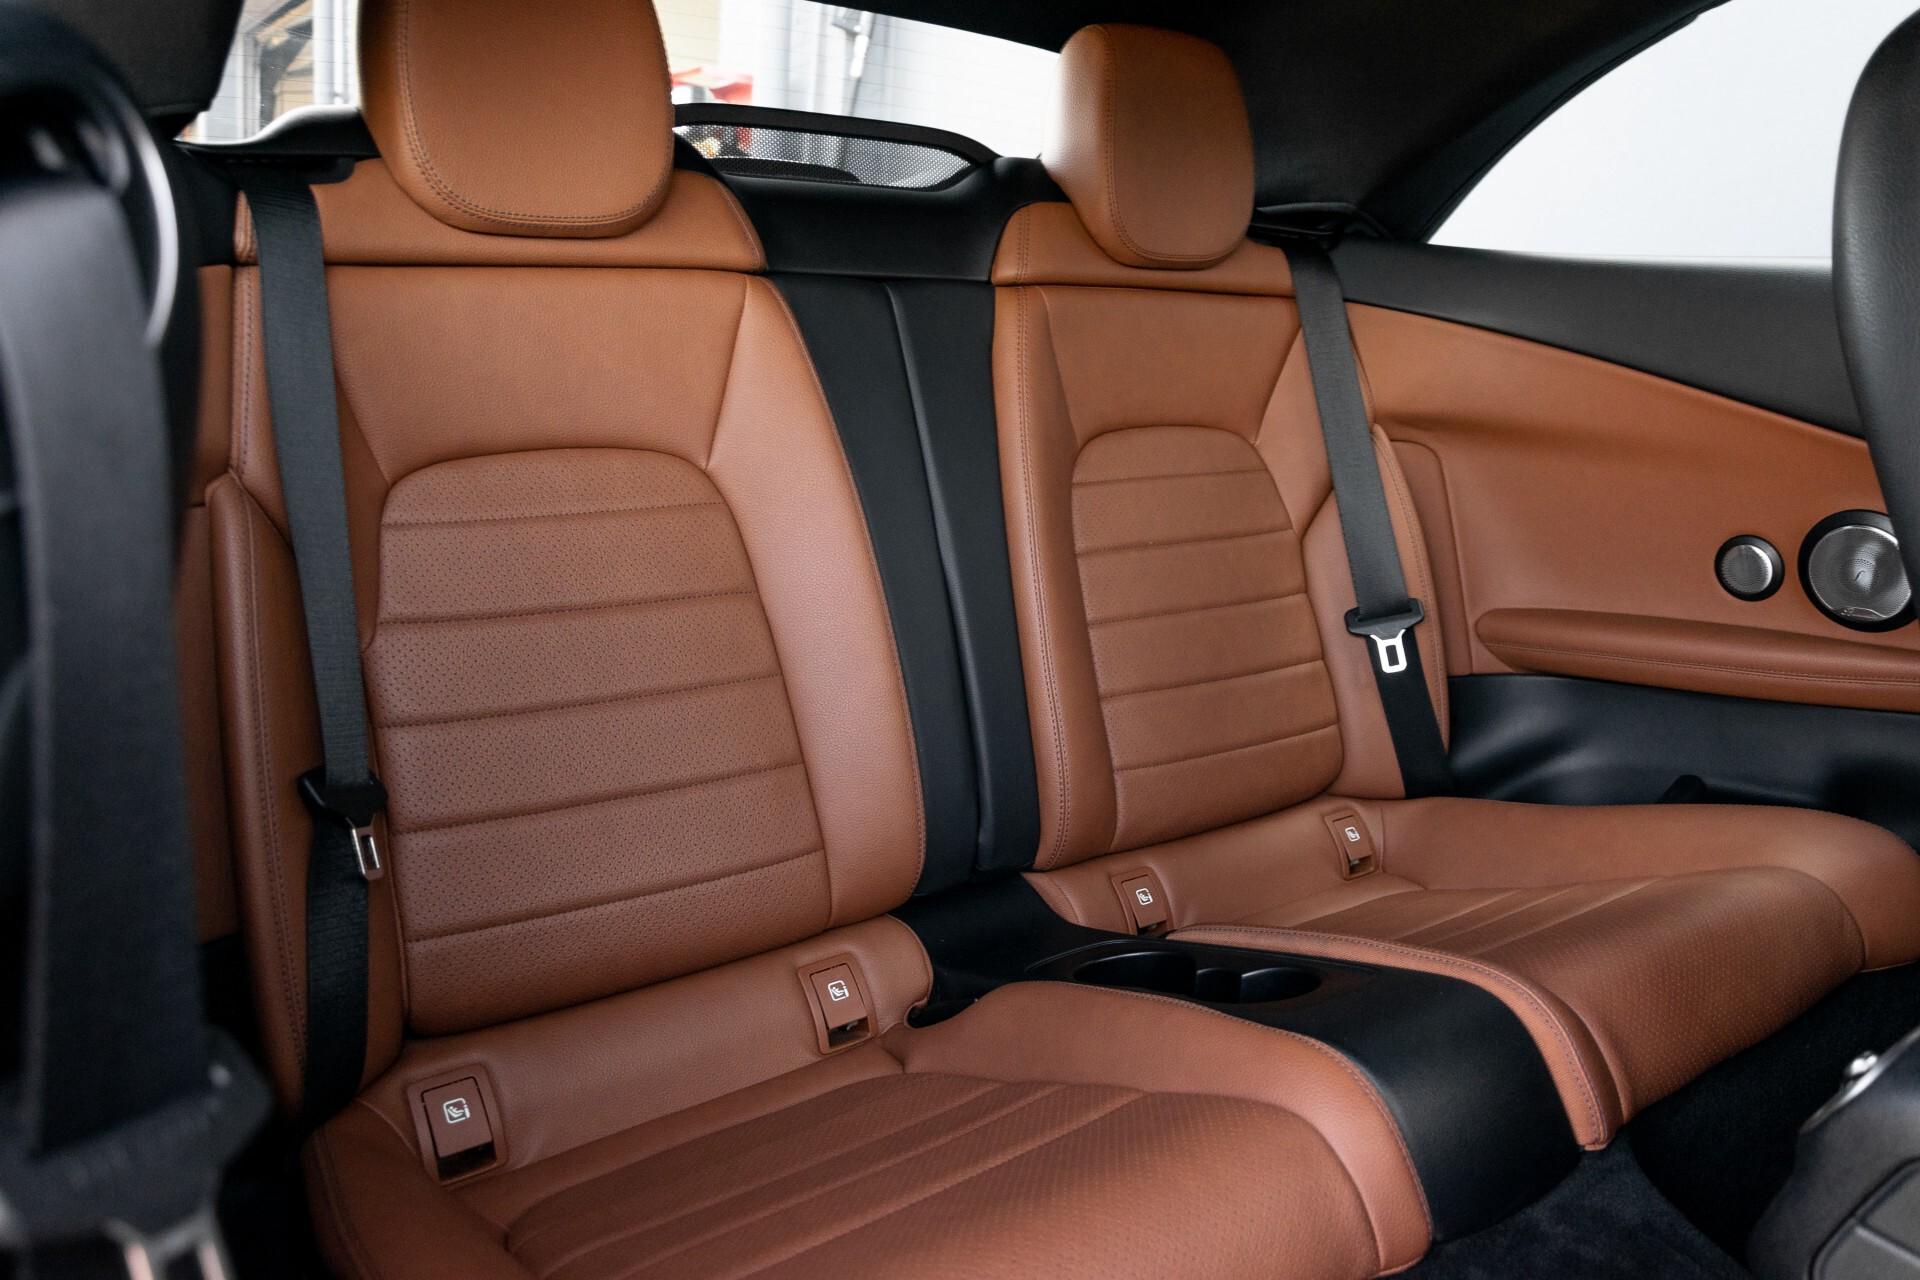 Mercedes-Benz C-Klasse 300 Cabriolet AMG Carbon/Airscarf/Aircap/Comand/Zadelbruin leder/Burmester Aut9 Foto 7